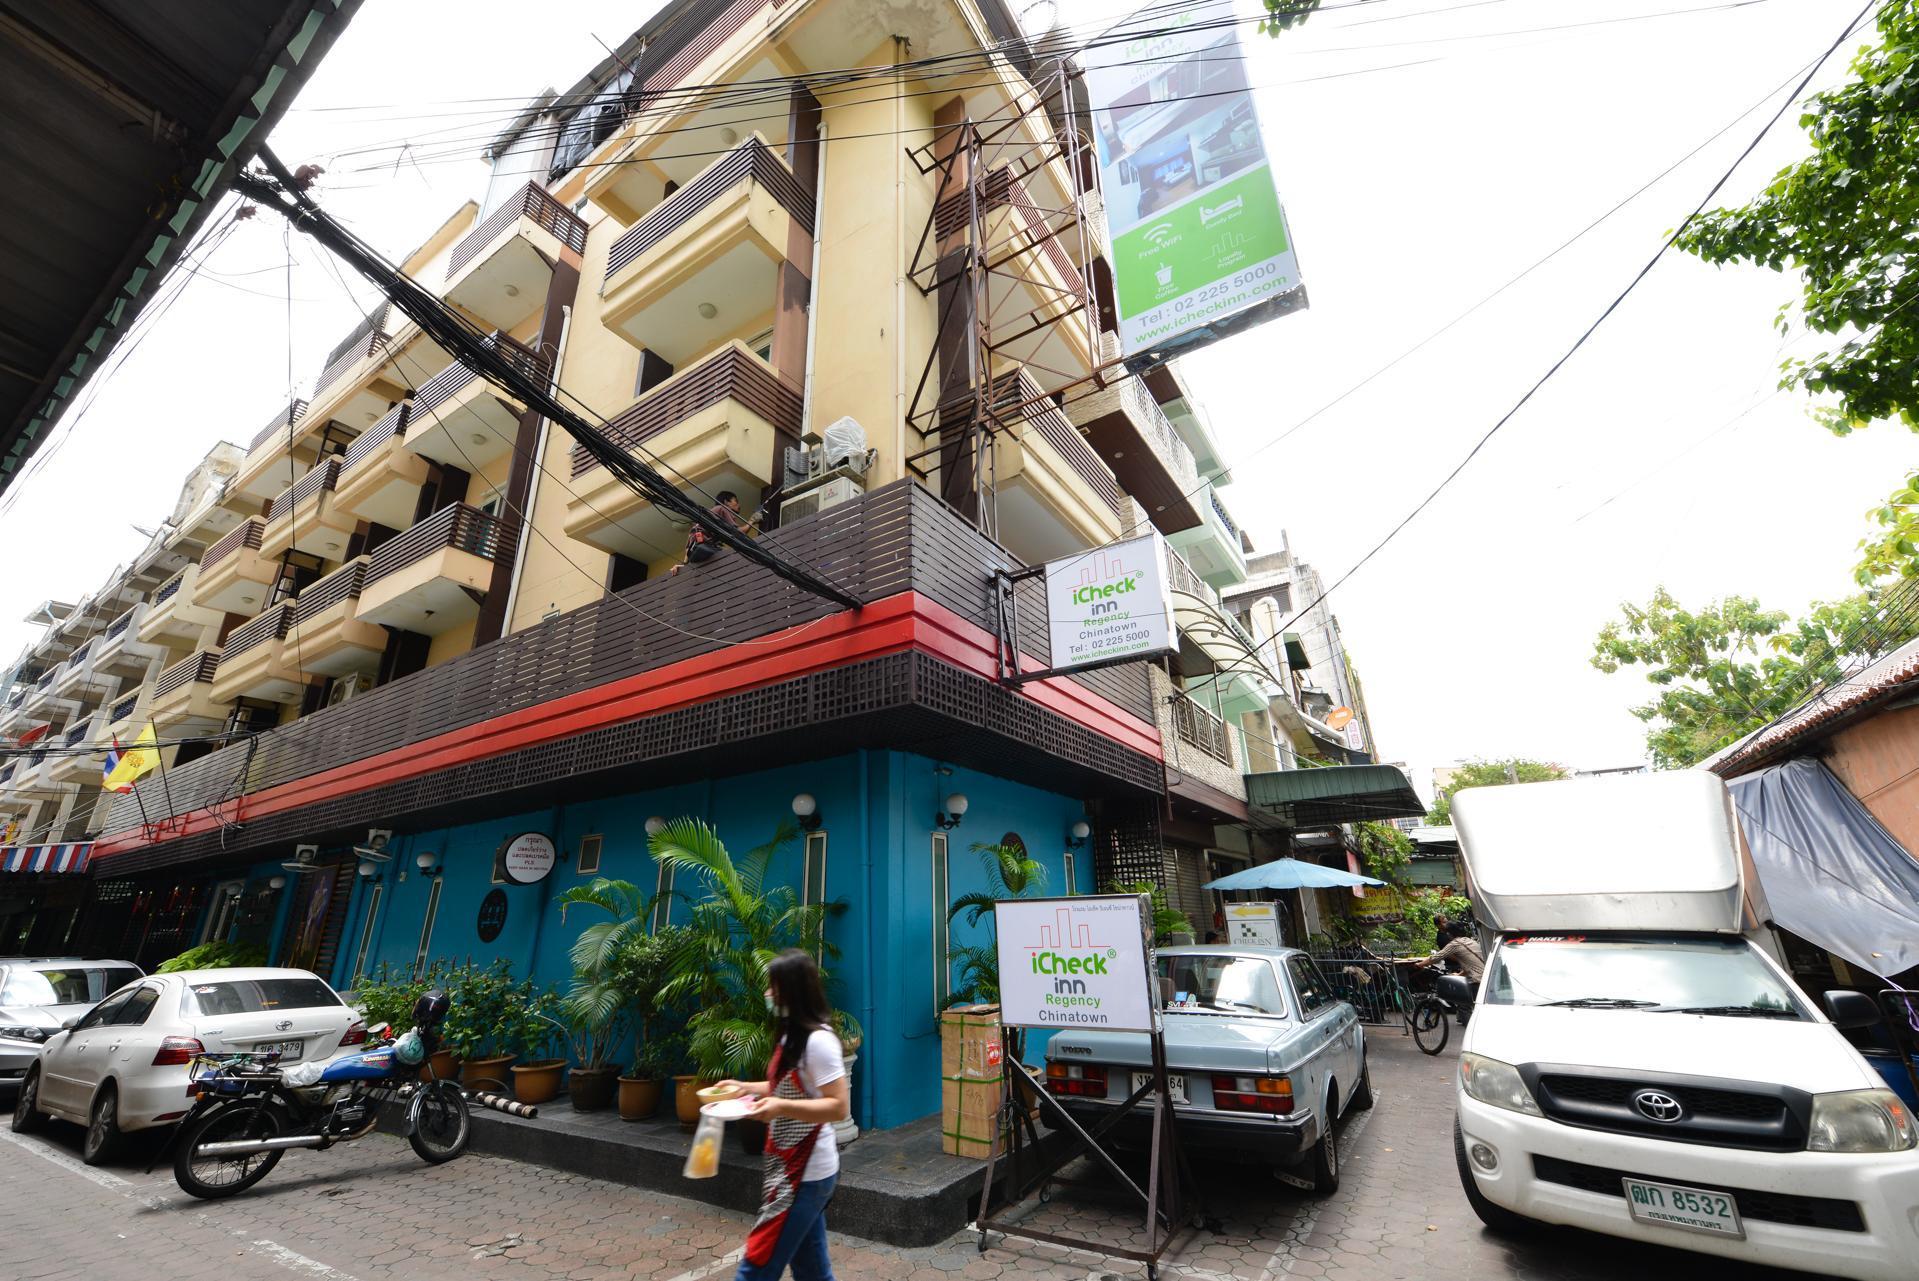 iCheck inn Regency Chinatown, Samphantawong